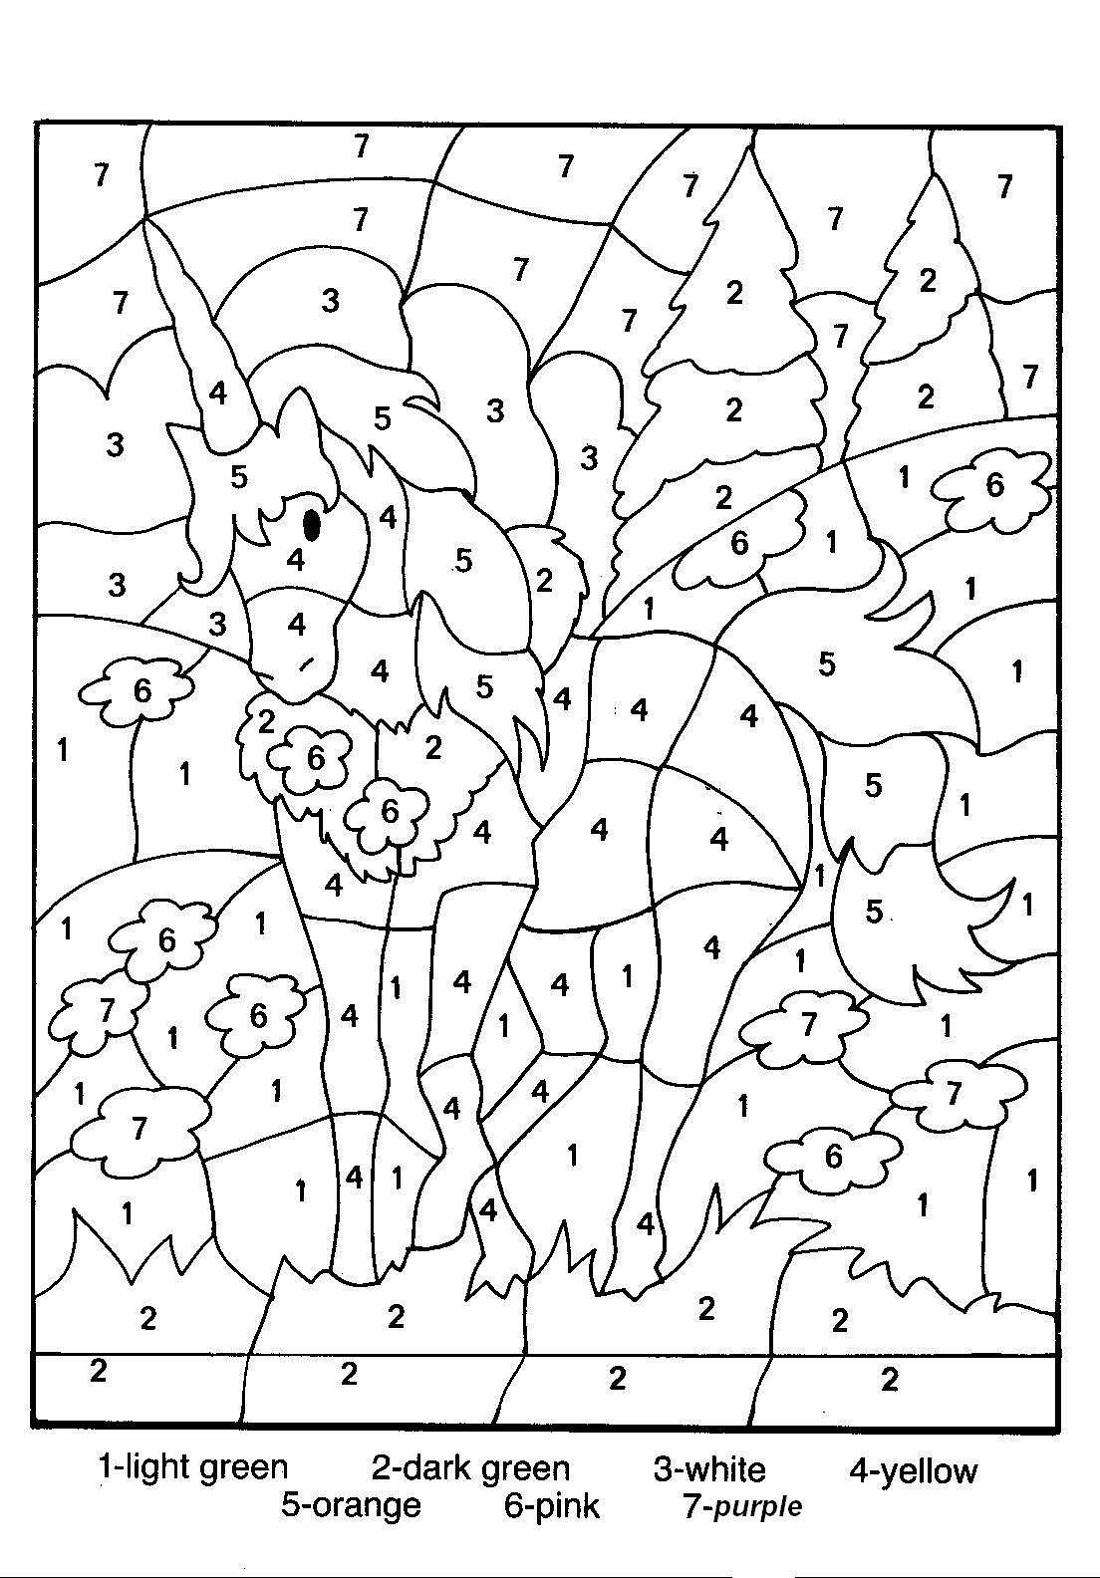 unicorn hard color by number worksheets